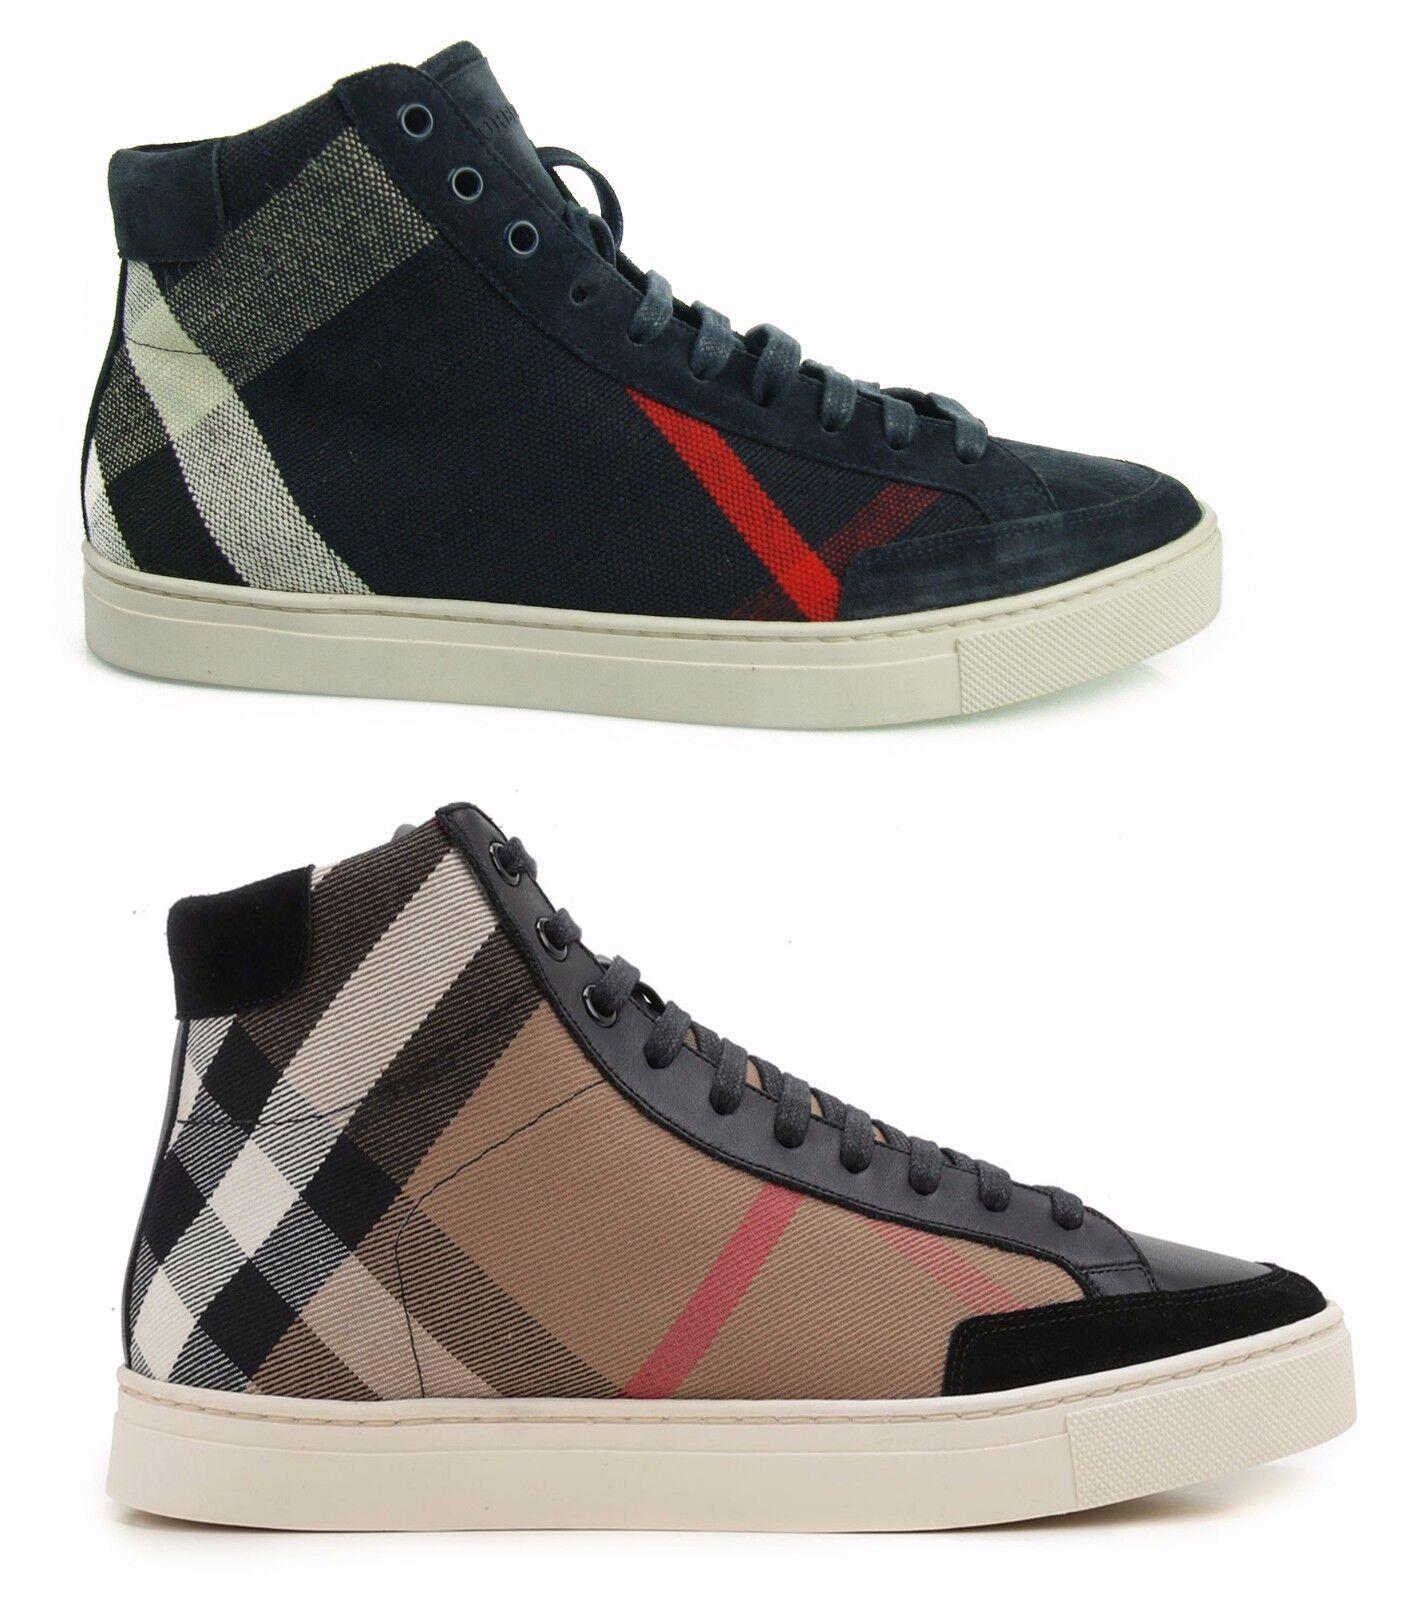 BURBERRY  SNEAKERS MAN HI TOP Zapatos Zapatos  BURBERRY HERRENSHUHE Zapatos Hombre 100%AUT. 1d3c97